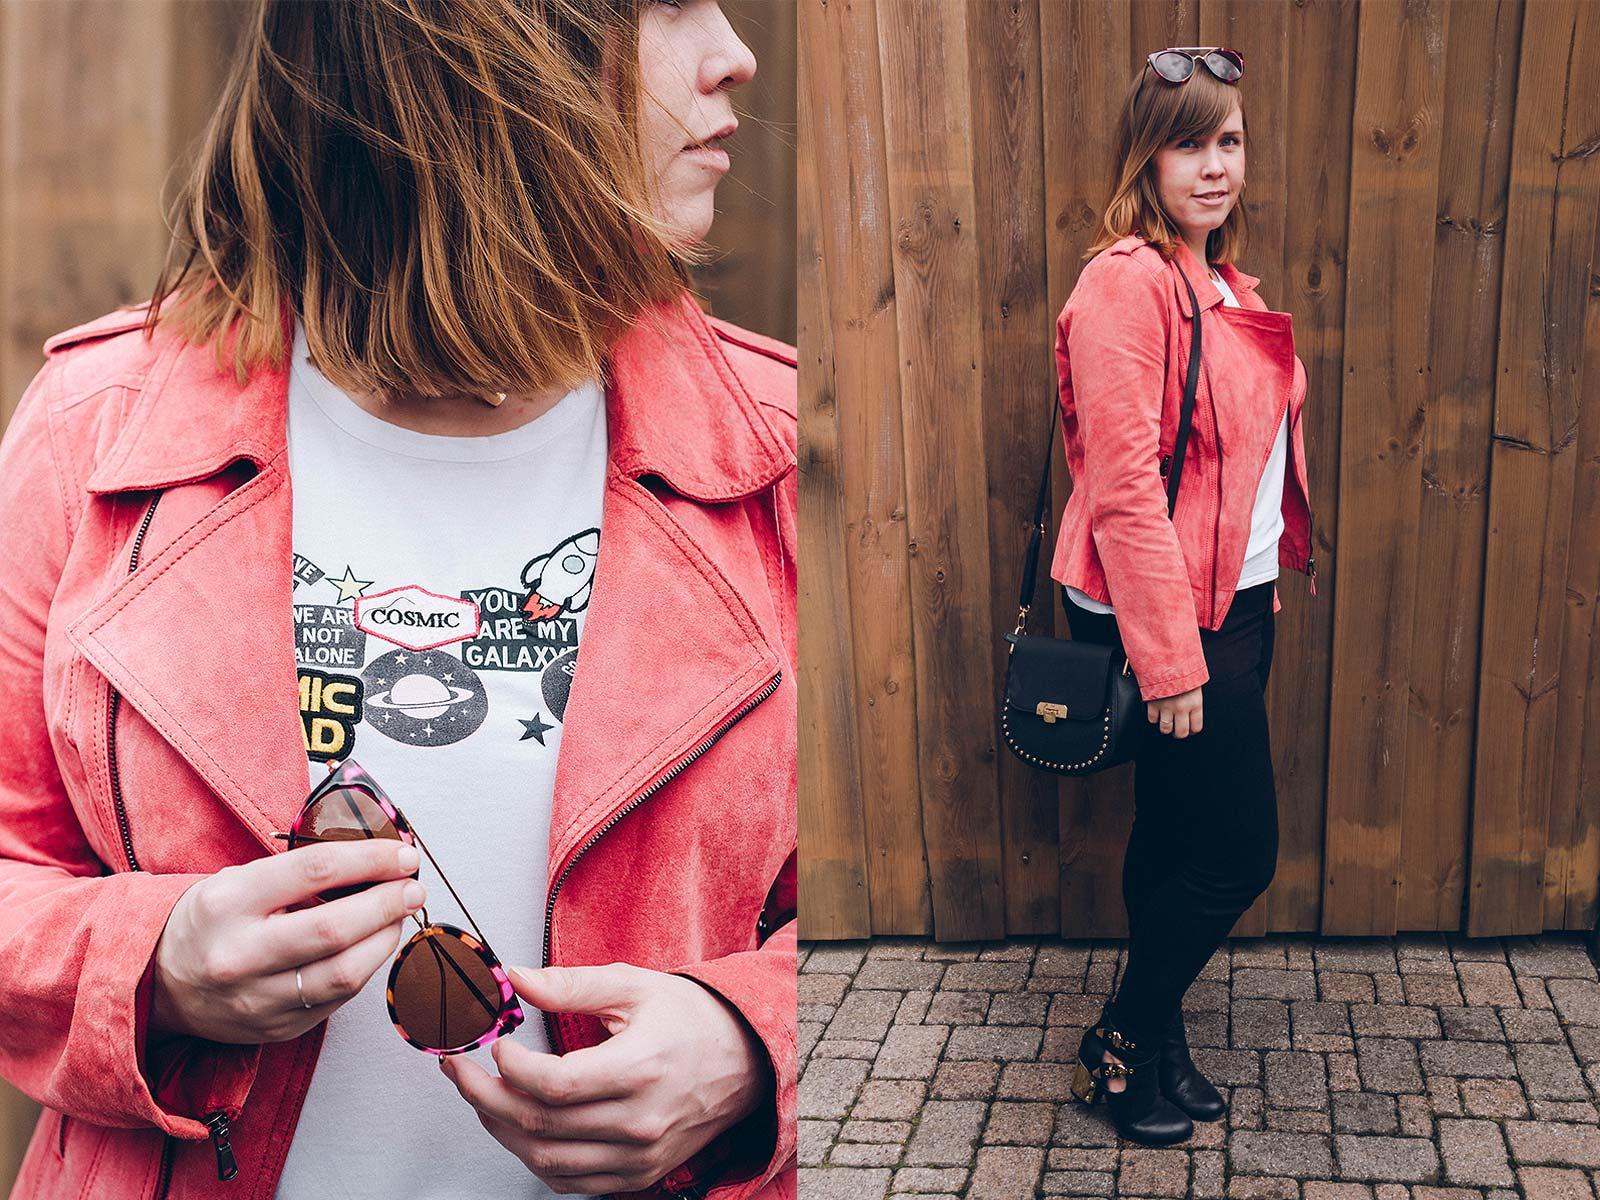 Meine Lieblingslederjacke aus Wildleder in der Trendfarbe Orange. Outfit Styling Mrs.Dinosaur